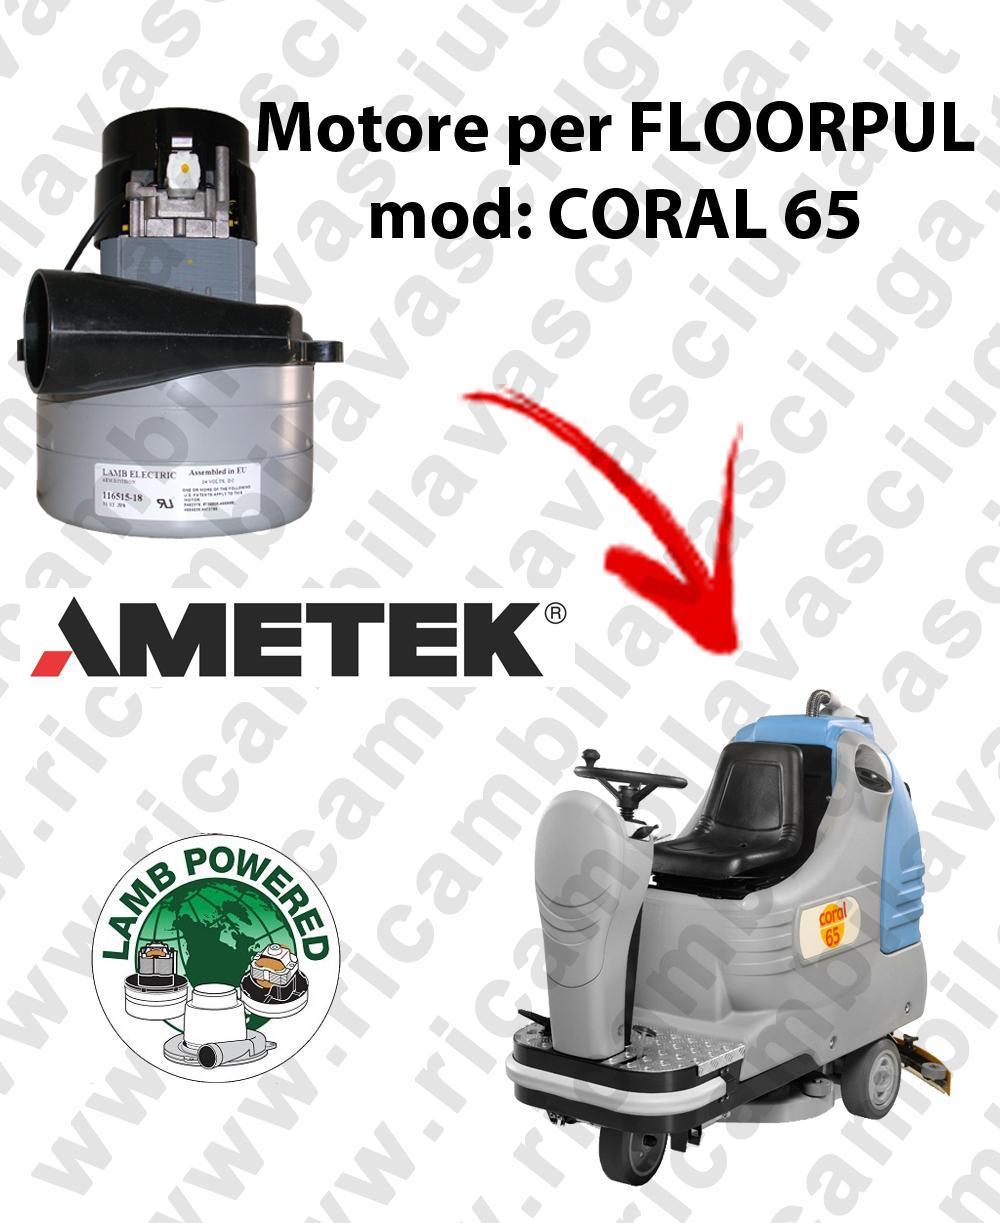 CORAL 65 Motore de aspiración LAMB AMETEK para fregadora FLOORPUL